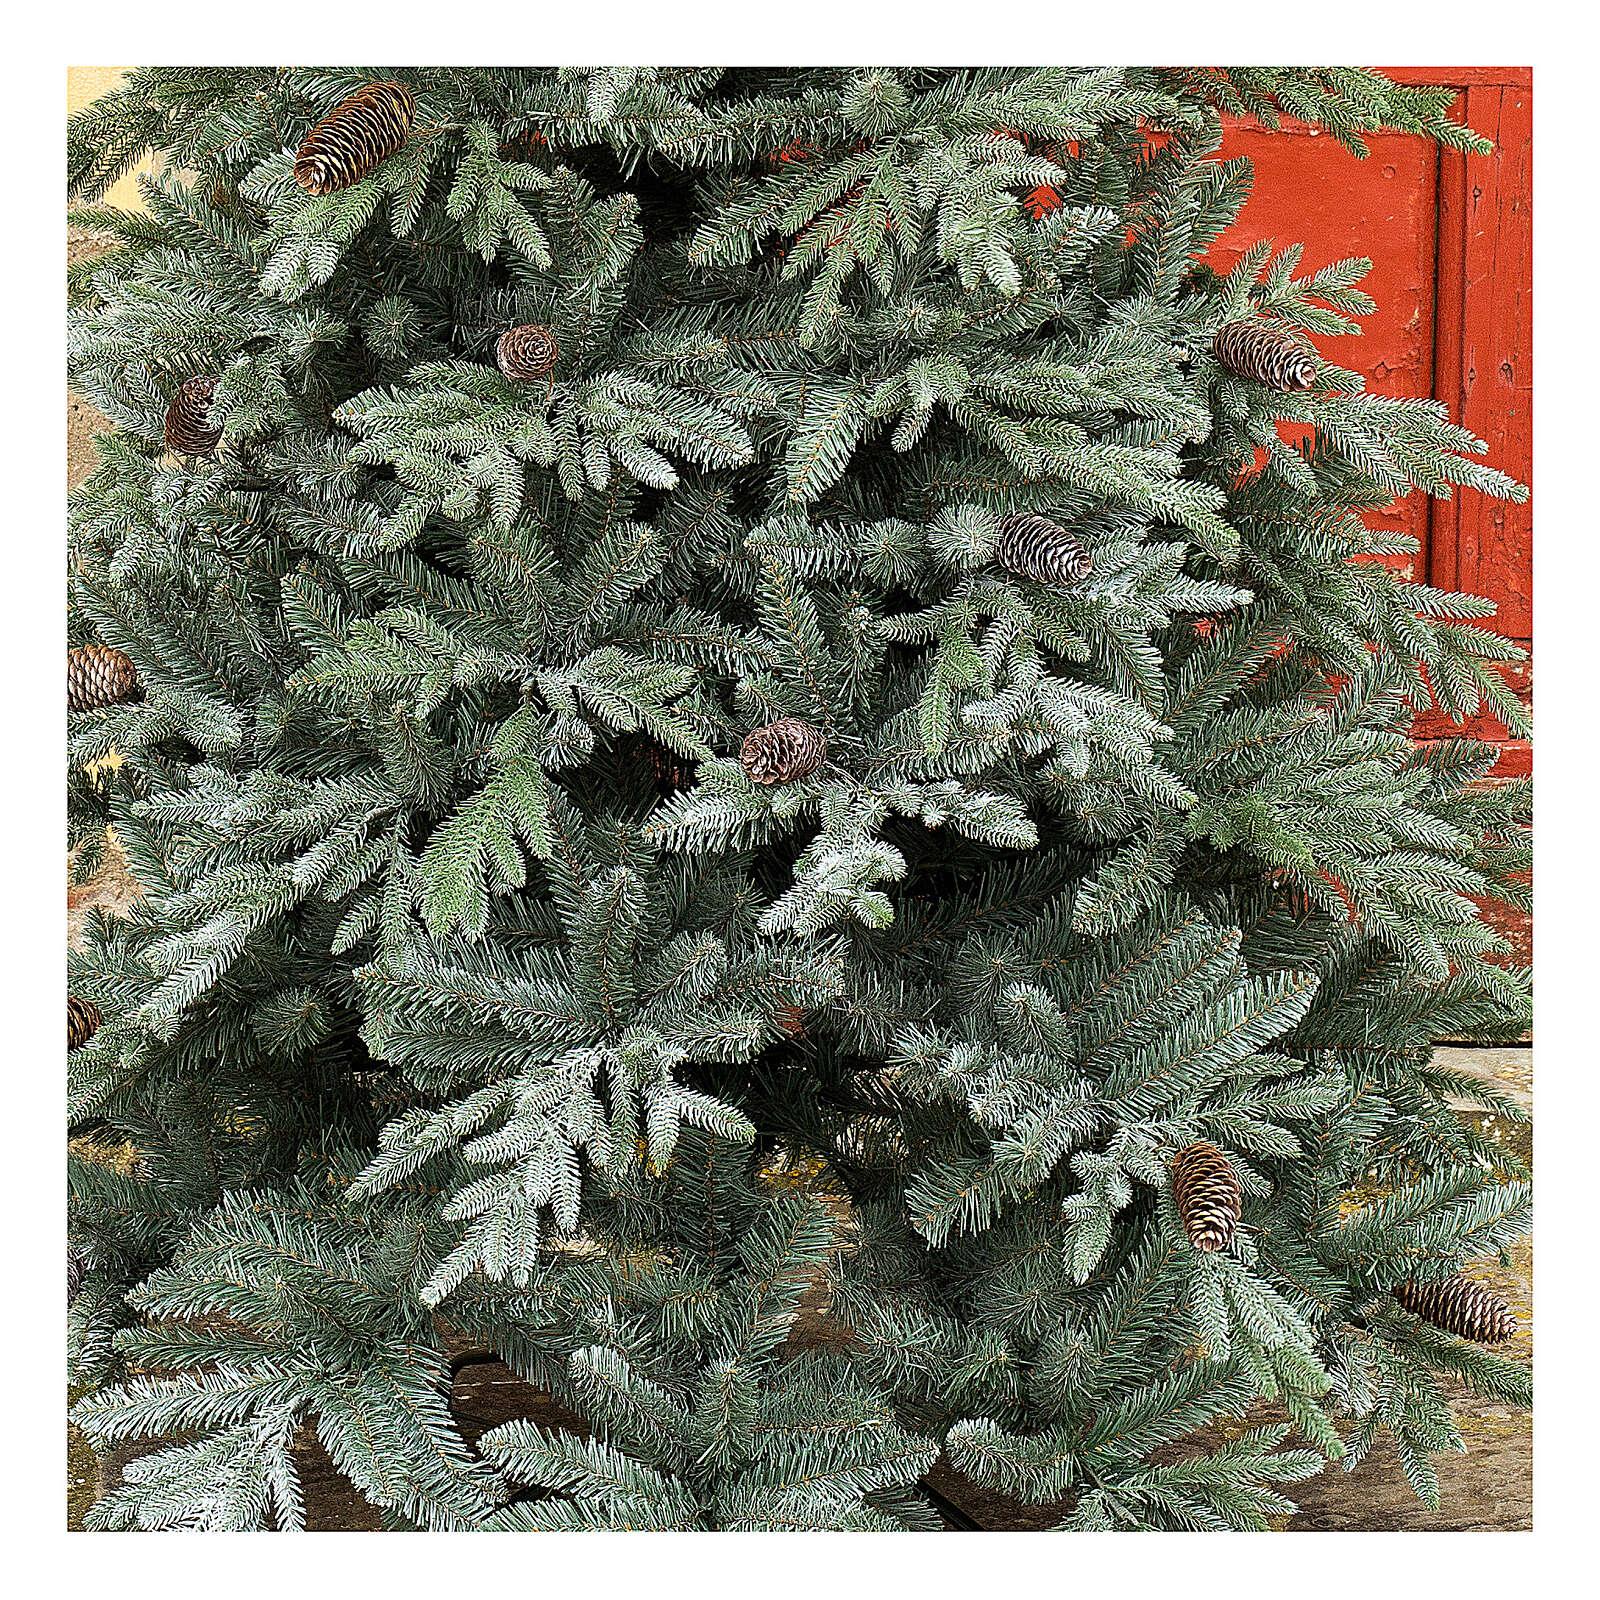 STOCK Albero di Natale 240 cm pigne Colorado Blue pigne per esterno 3